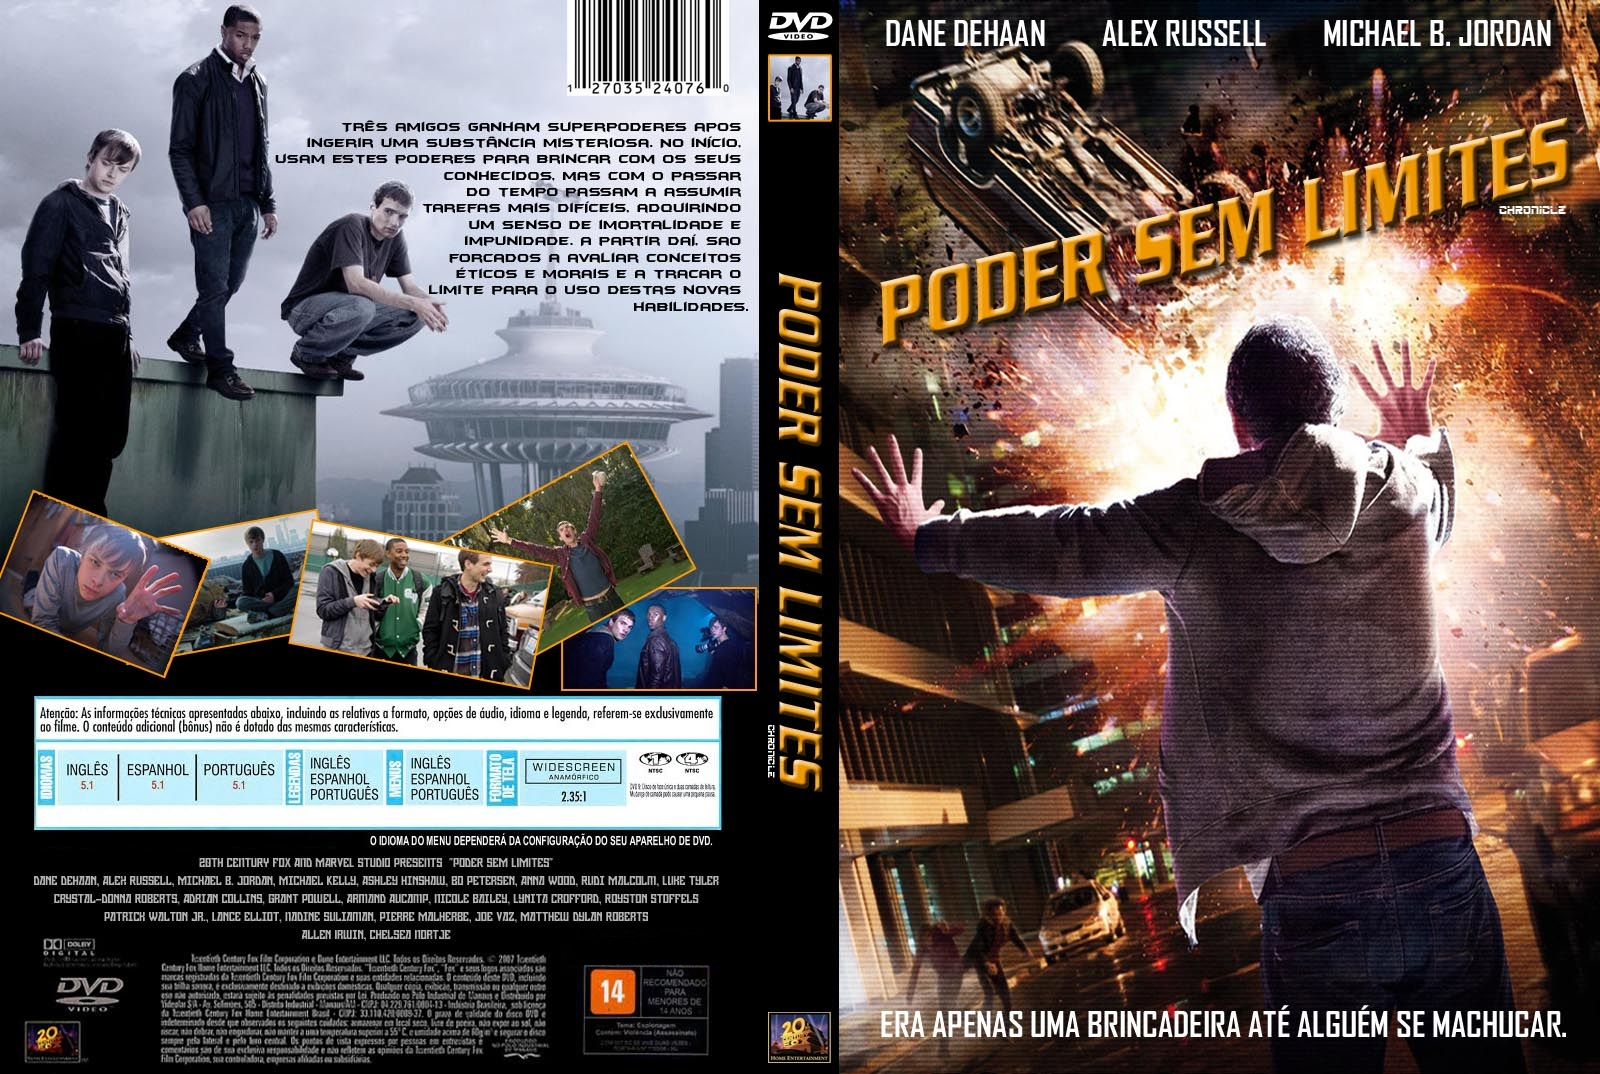 Poder Sem Limites DVD Capa